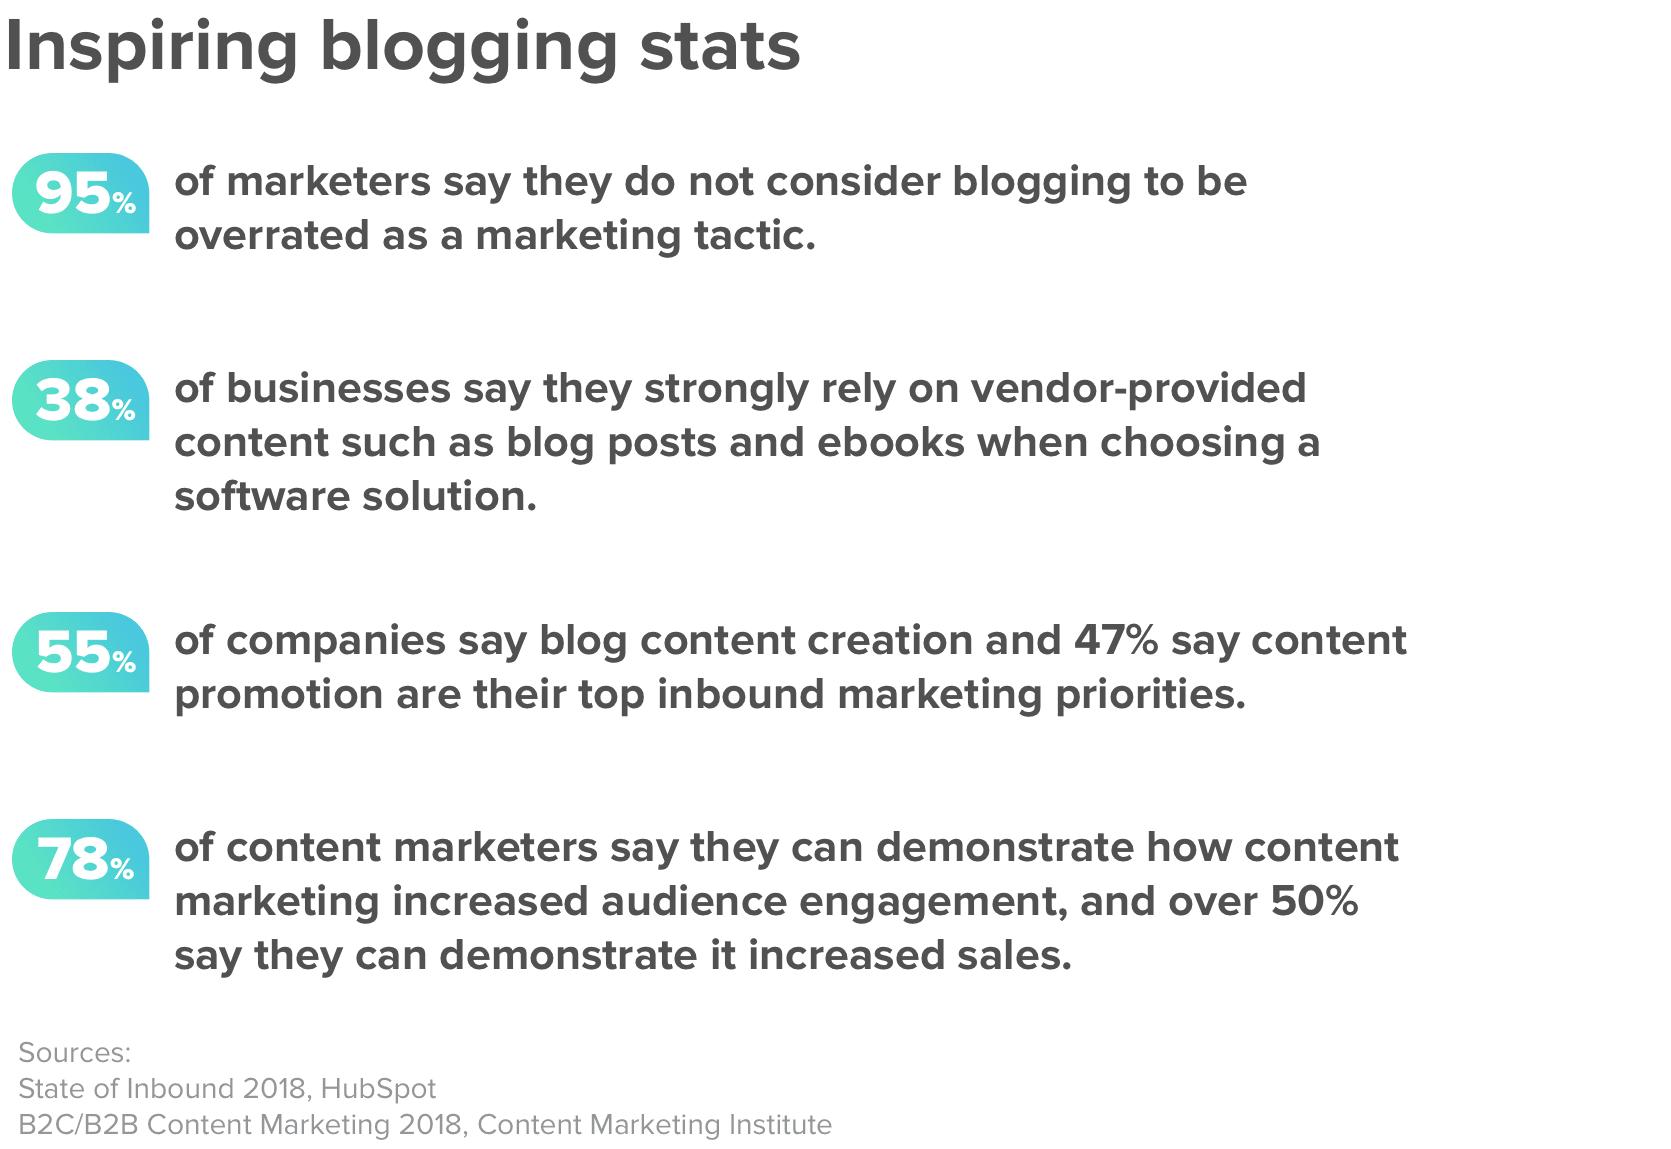 Inspiring blogging statistics for 2019